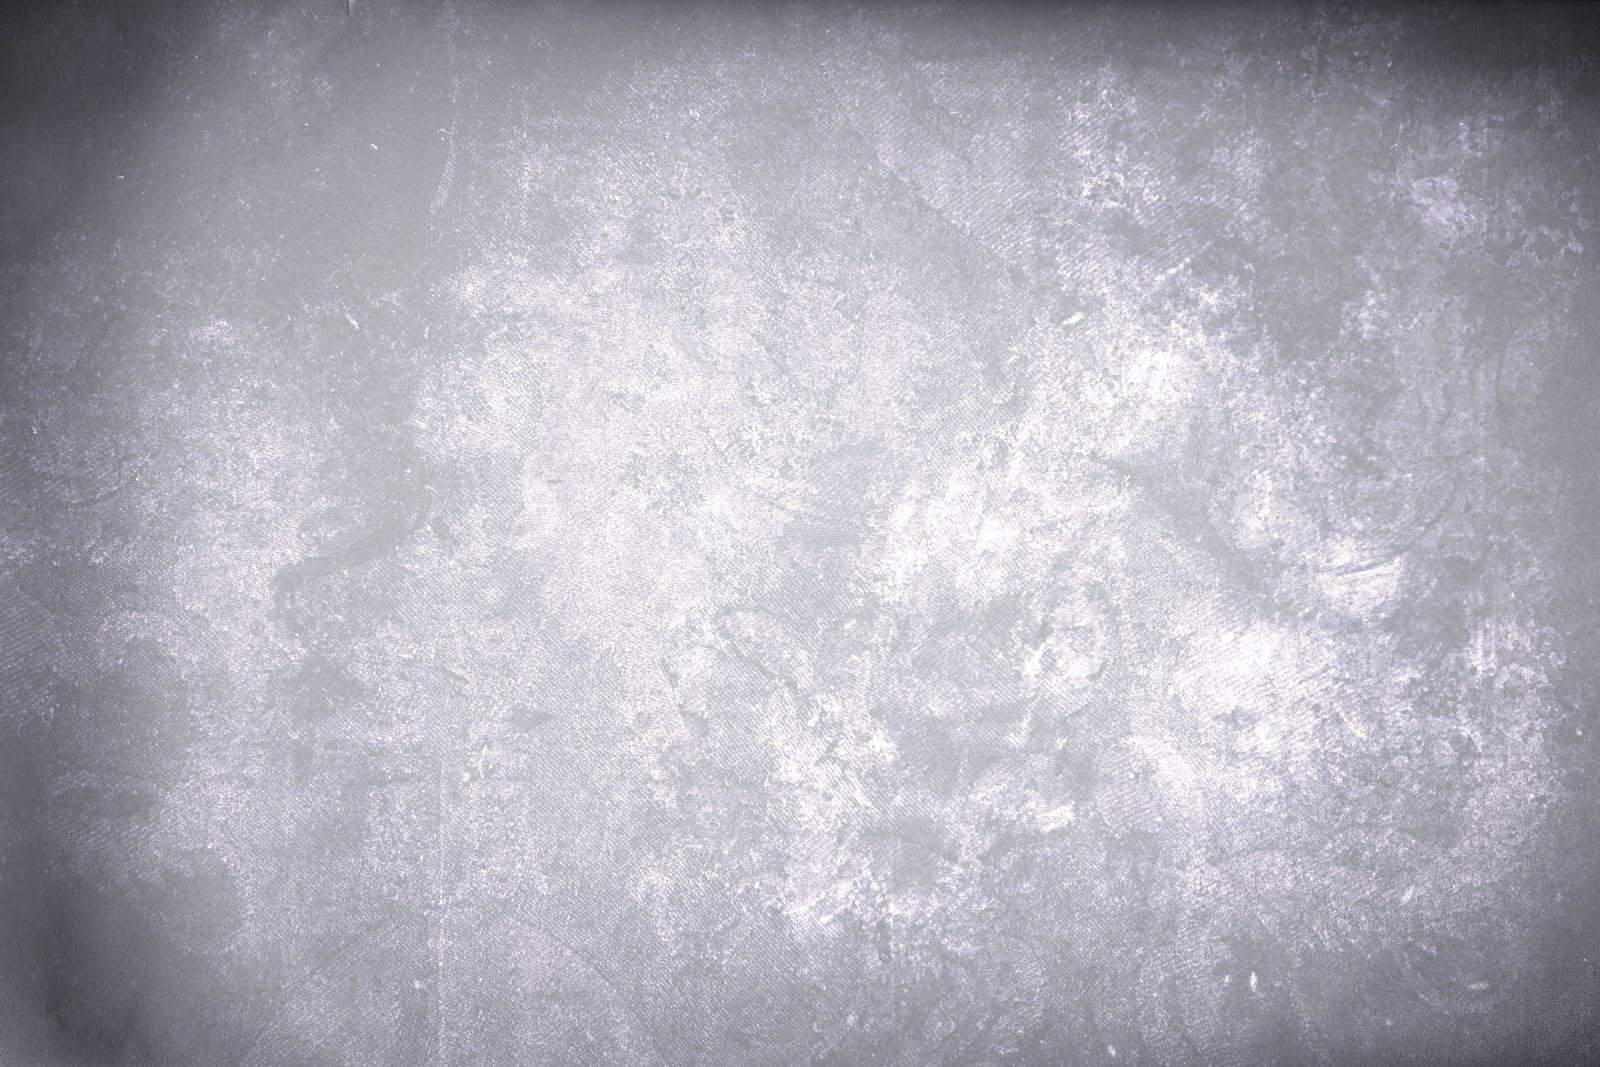 Soft Grunge Textures by ibjennyjenny grey 2jpg 1600x1067